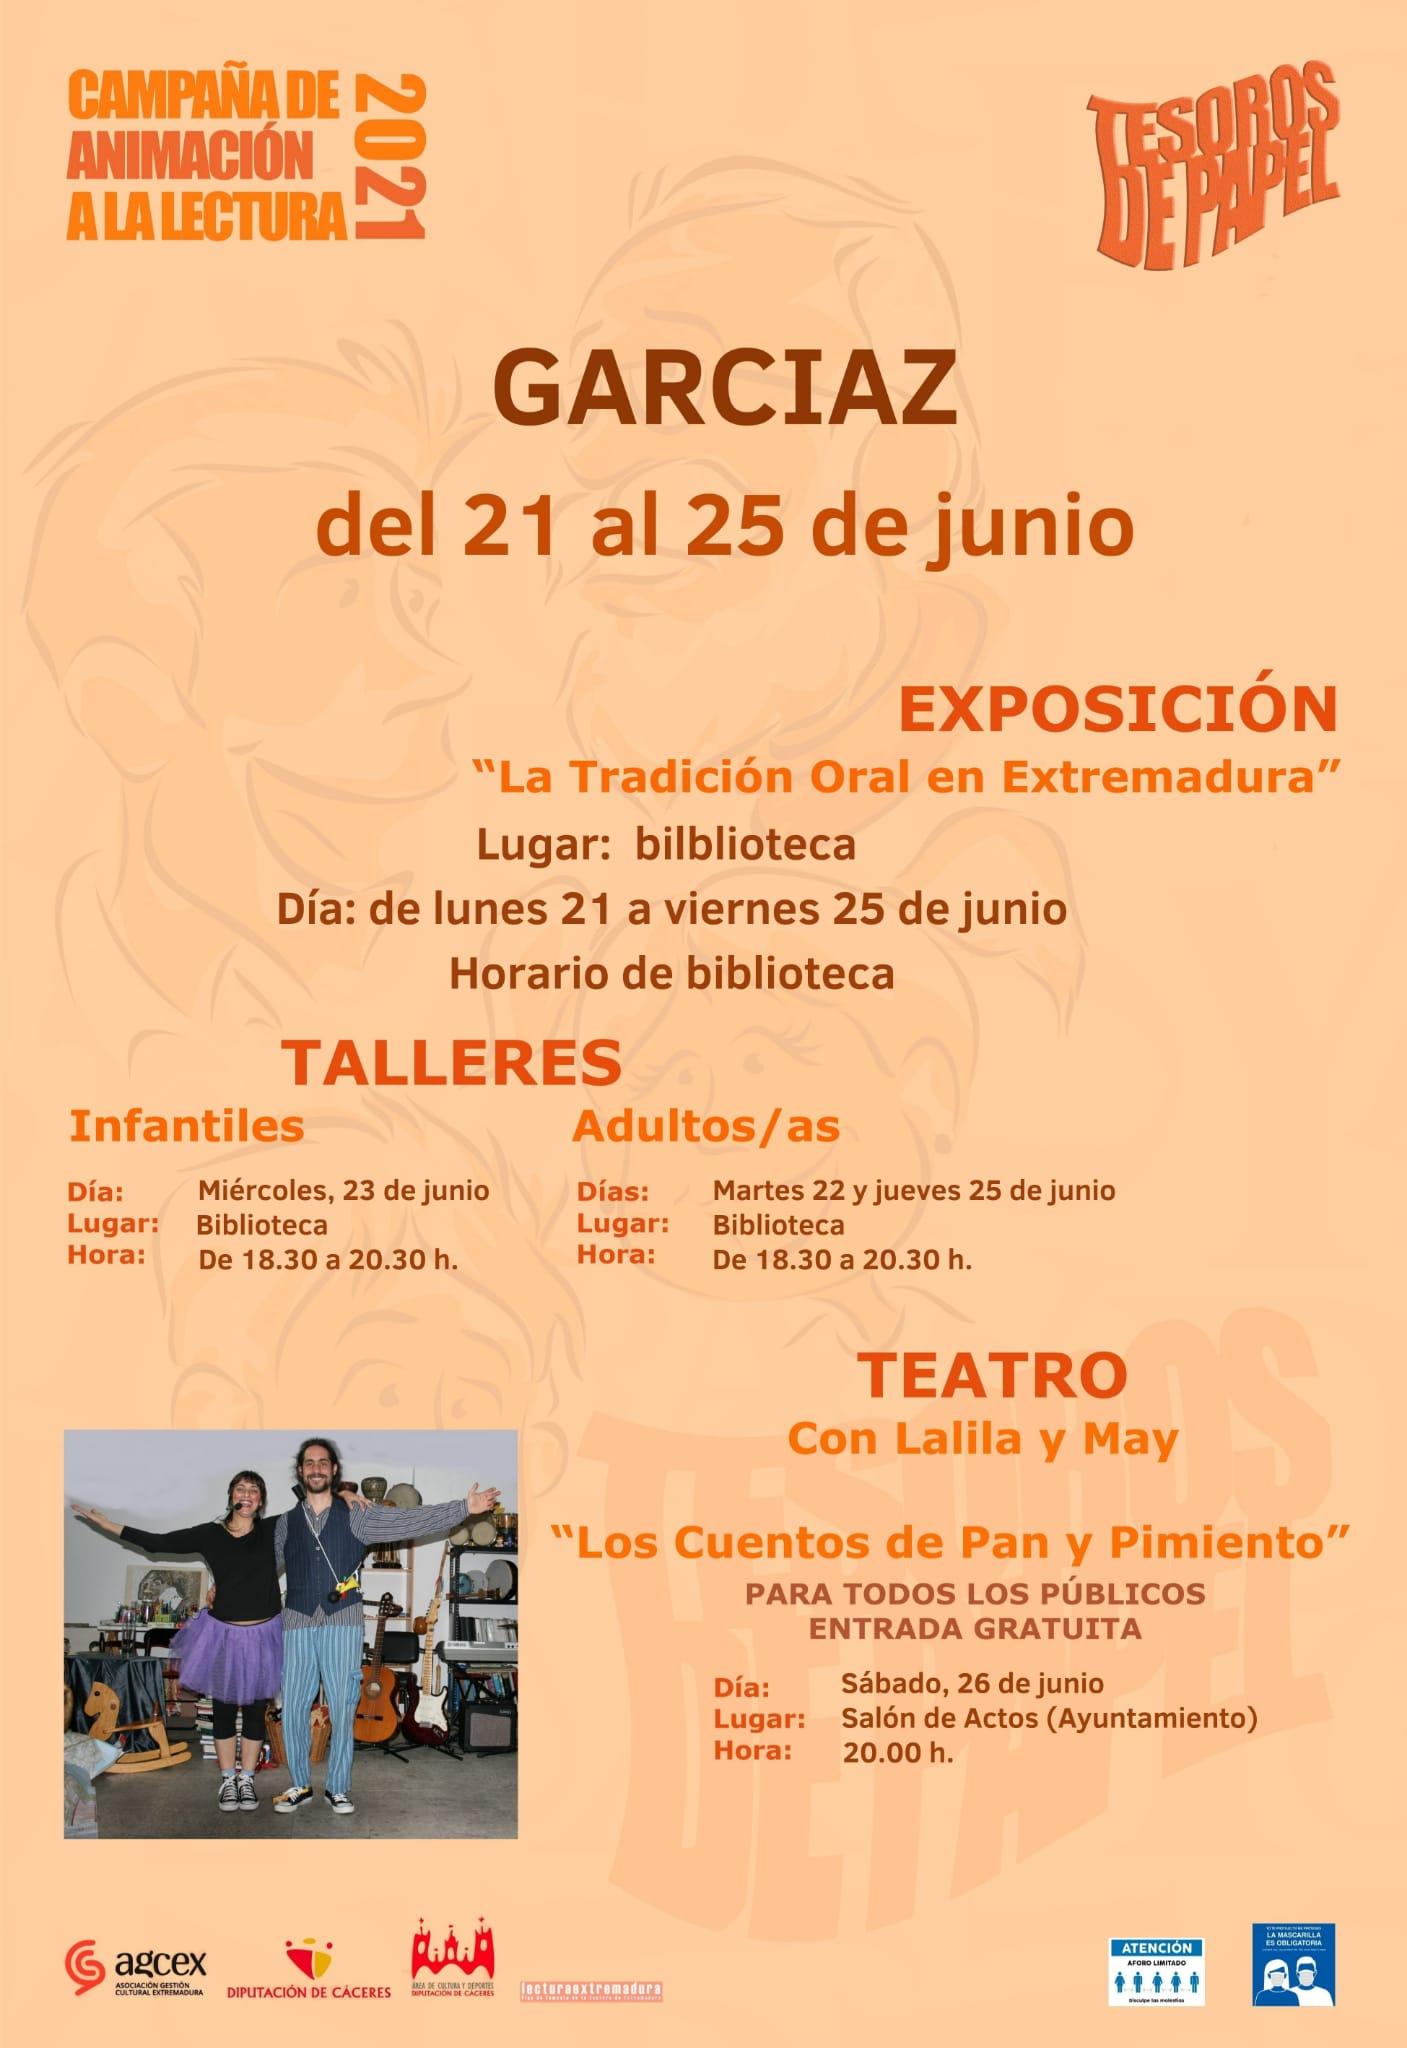 Campaña 'Tesoros de Papel'. Garciaz